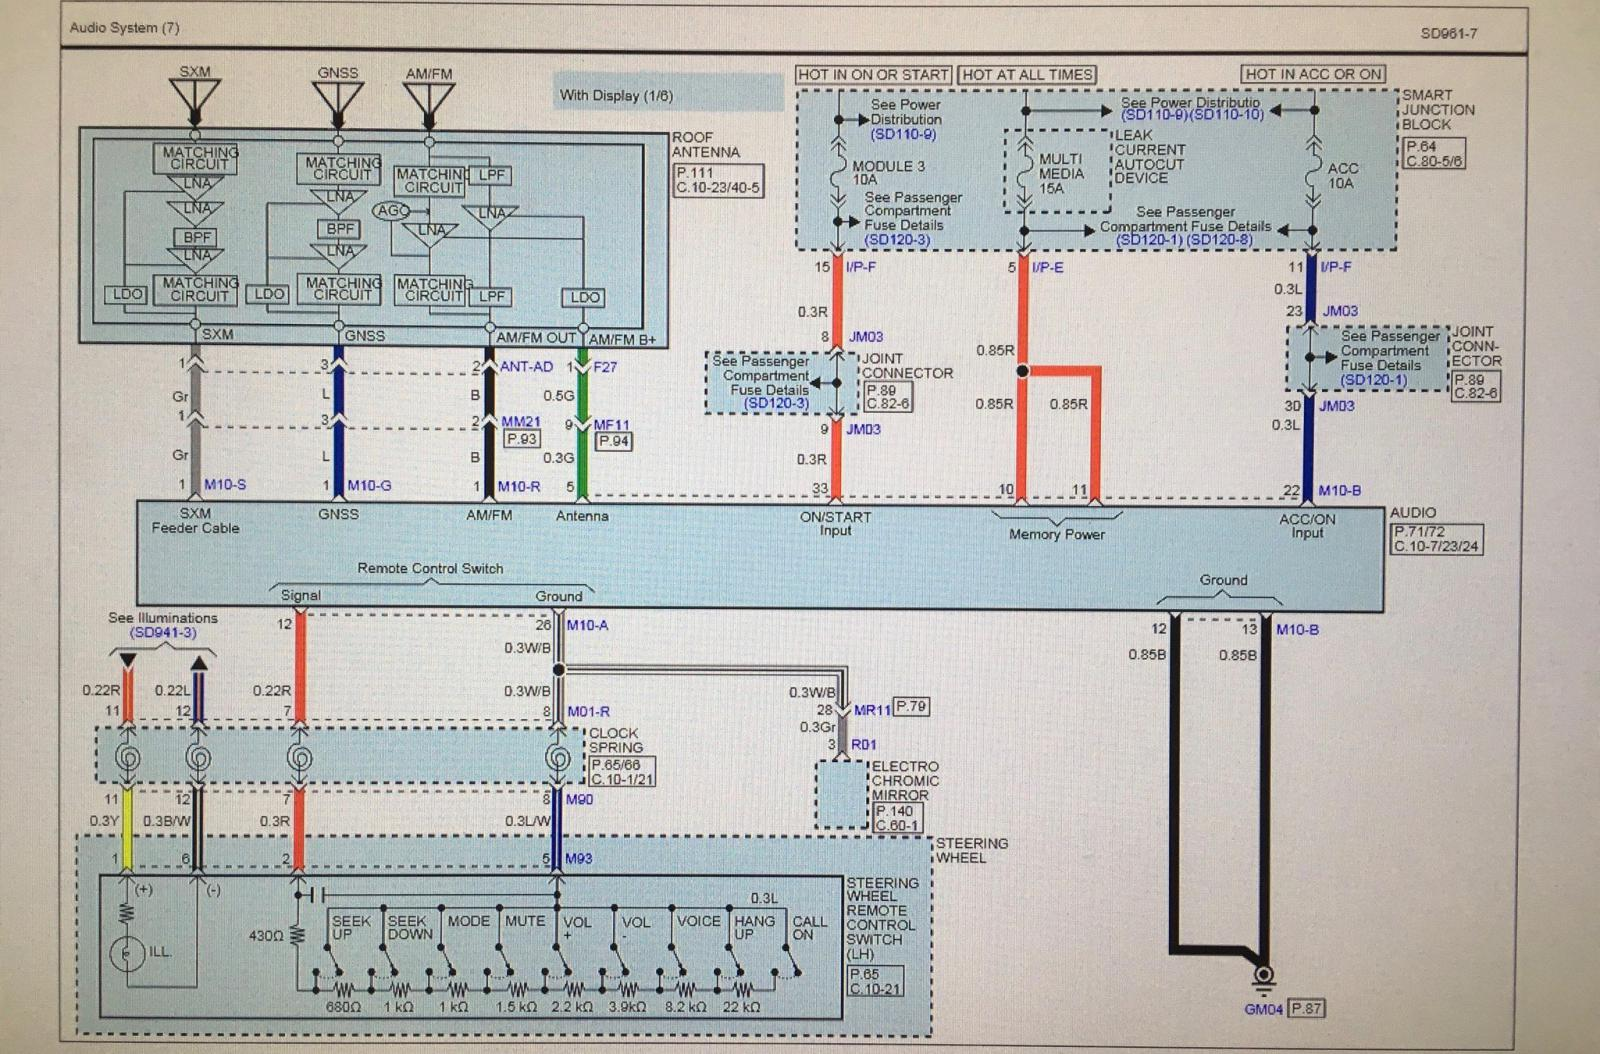 hight resolution of wiring diagram kia forum 61914d1462639615 wiring diagram img 1131 wiring diagram kia forum 2012 kia soul fuse